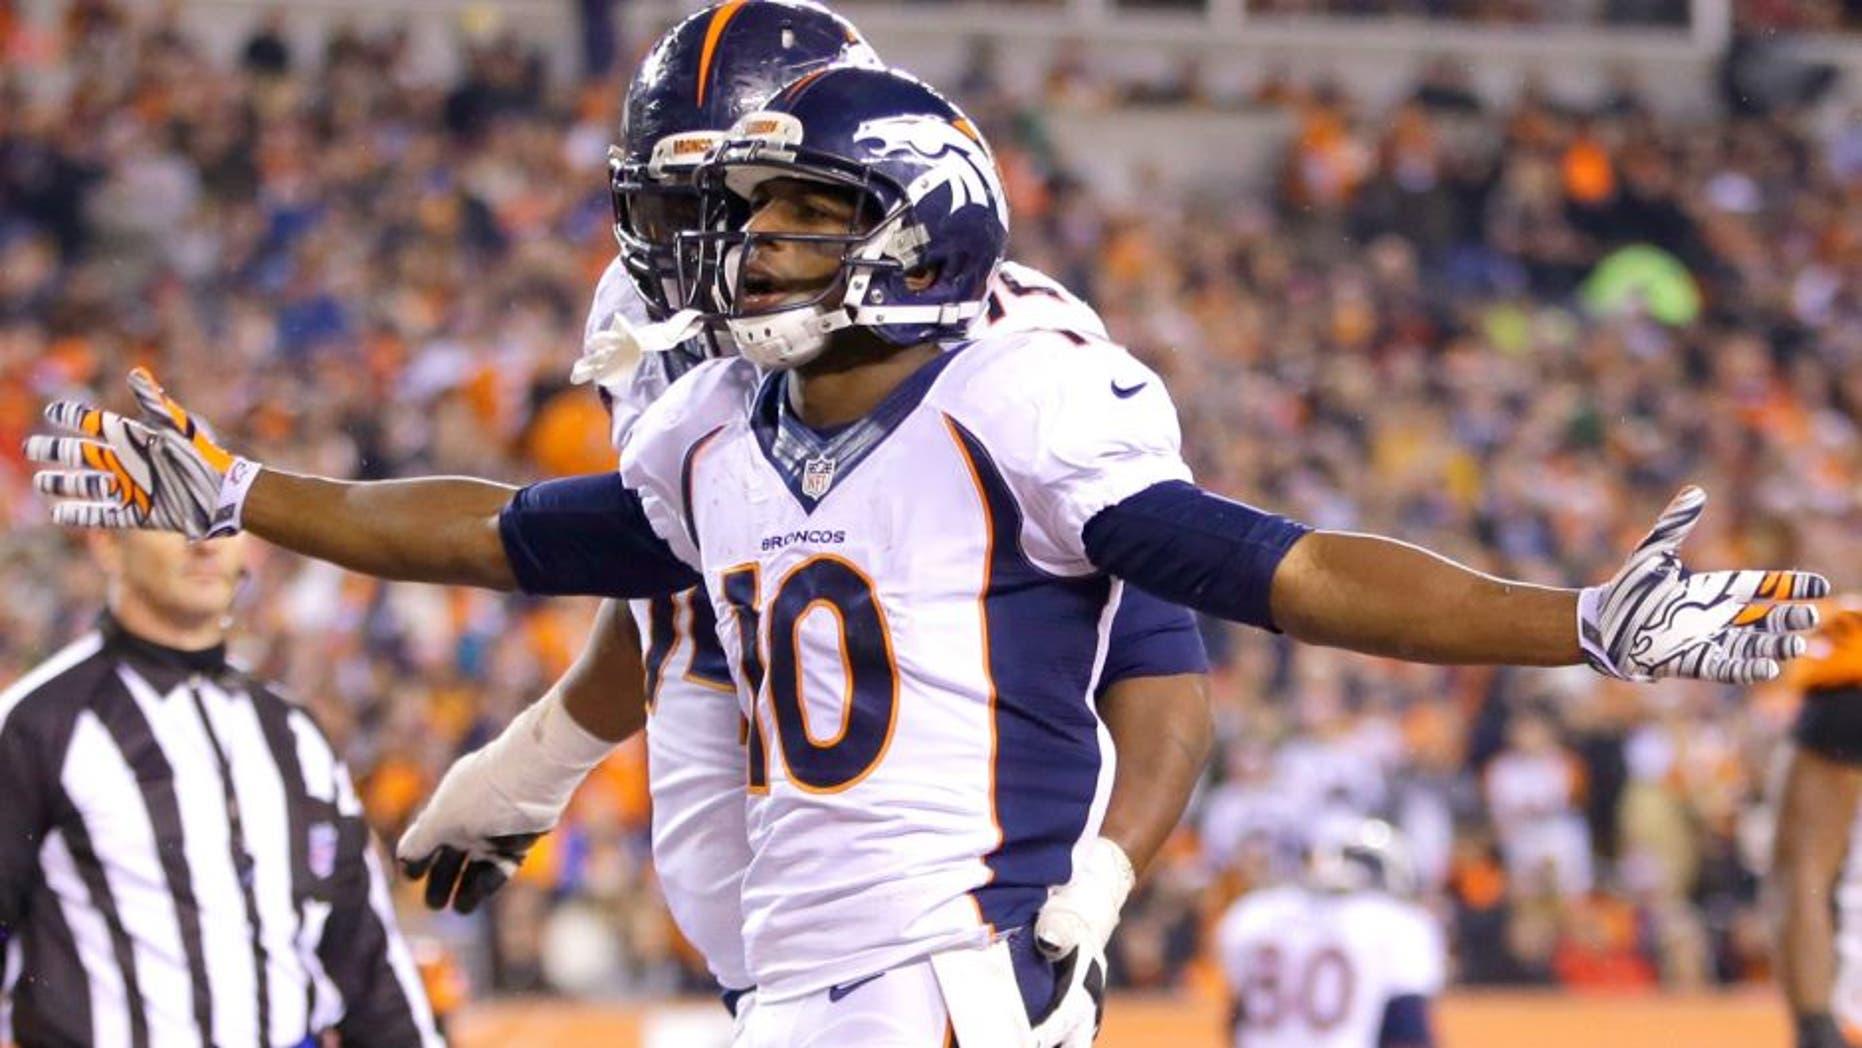 Denver Broncos wide receiver Emmanuel Sanders (10) reacts following a 4-yard touchdown reception during the second half of an NFL football game against the Cincinnati Bengals Monday, Dec. 22, 2014, in Cincinnati. (AP Photo/AJ Mast)